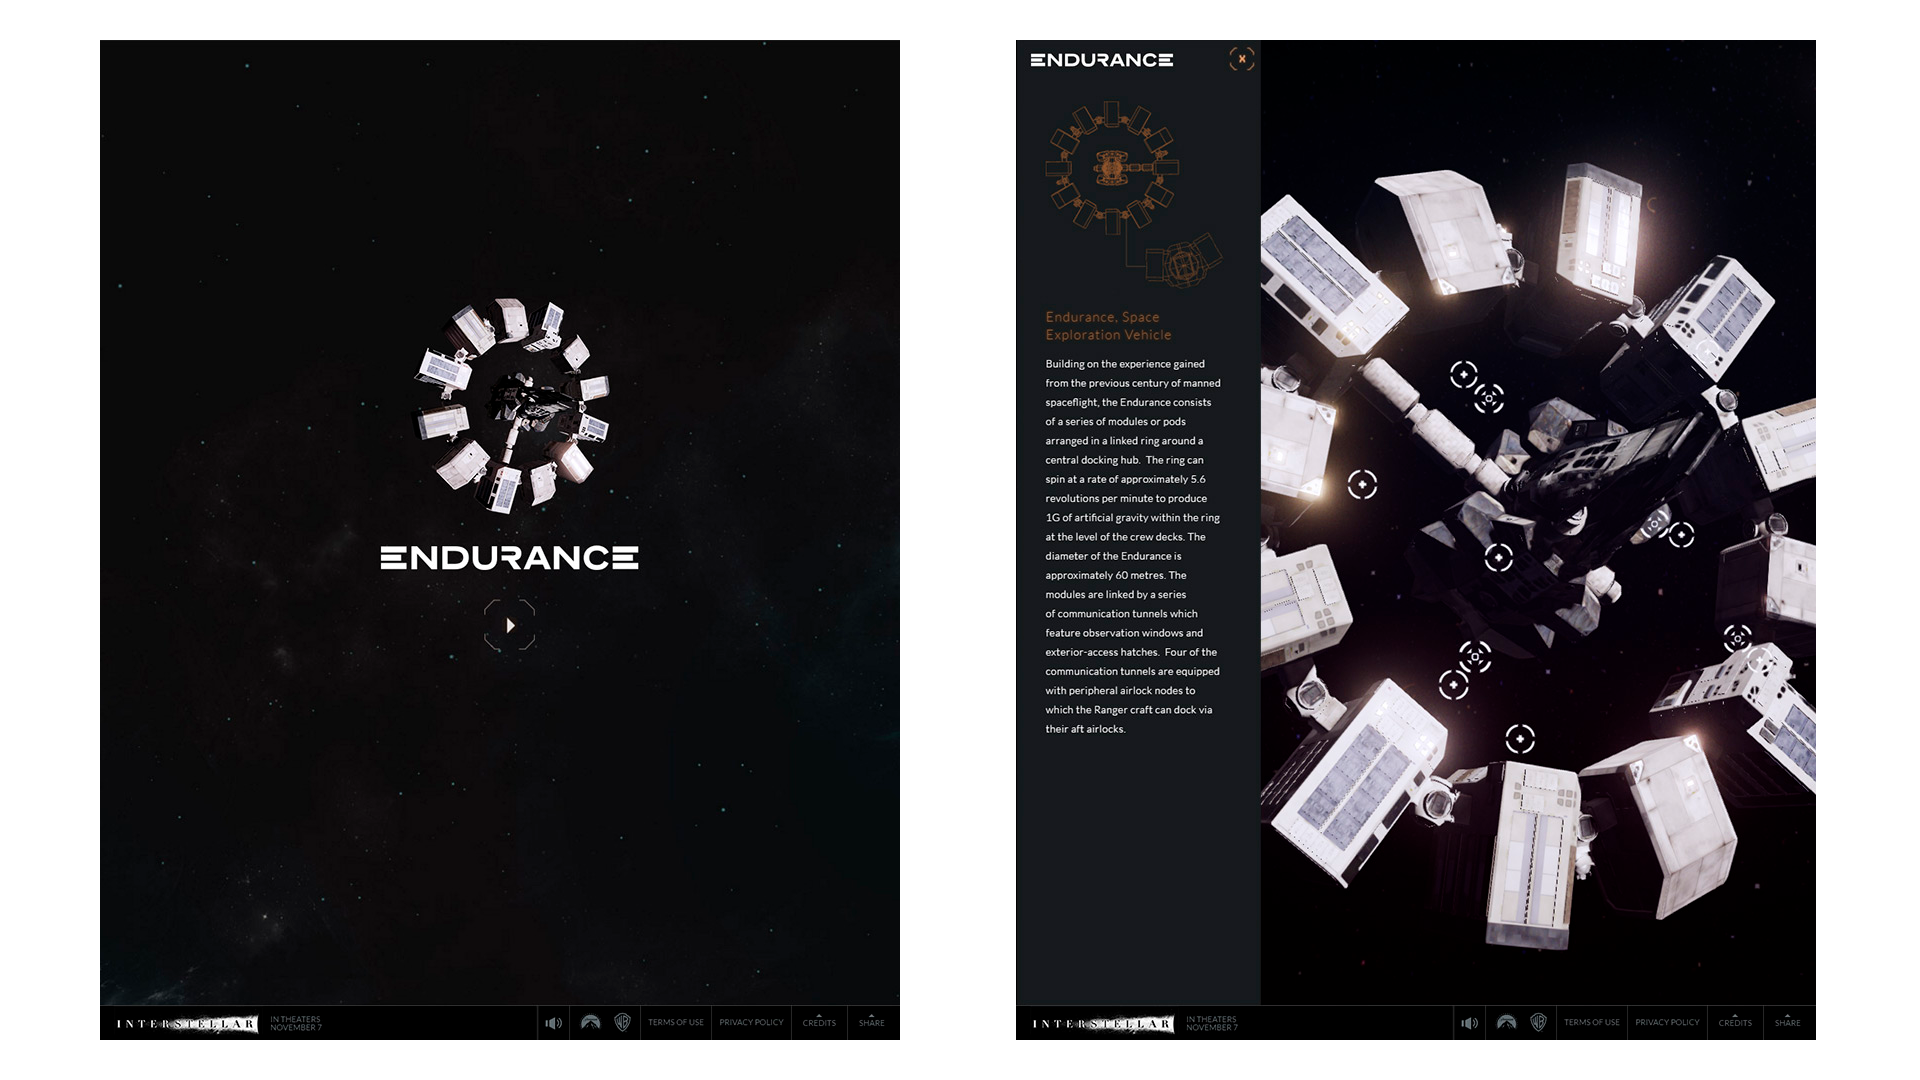 endurance_02